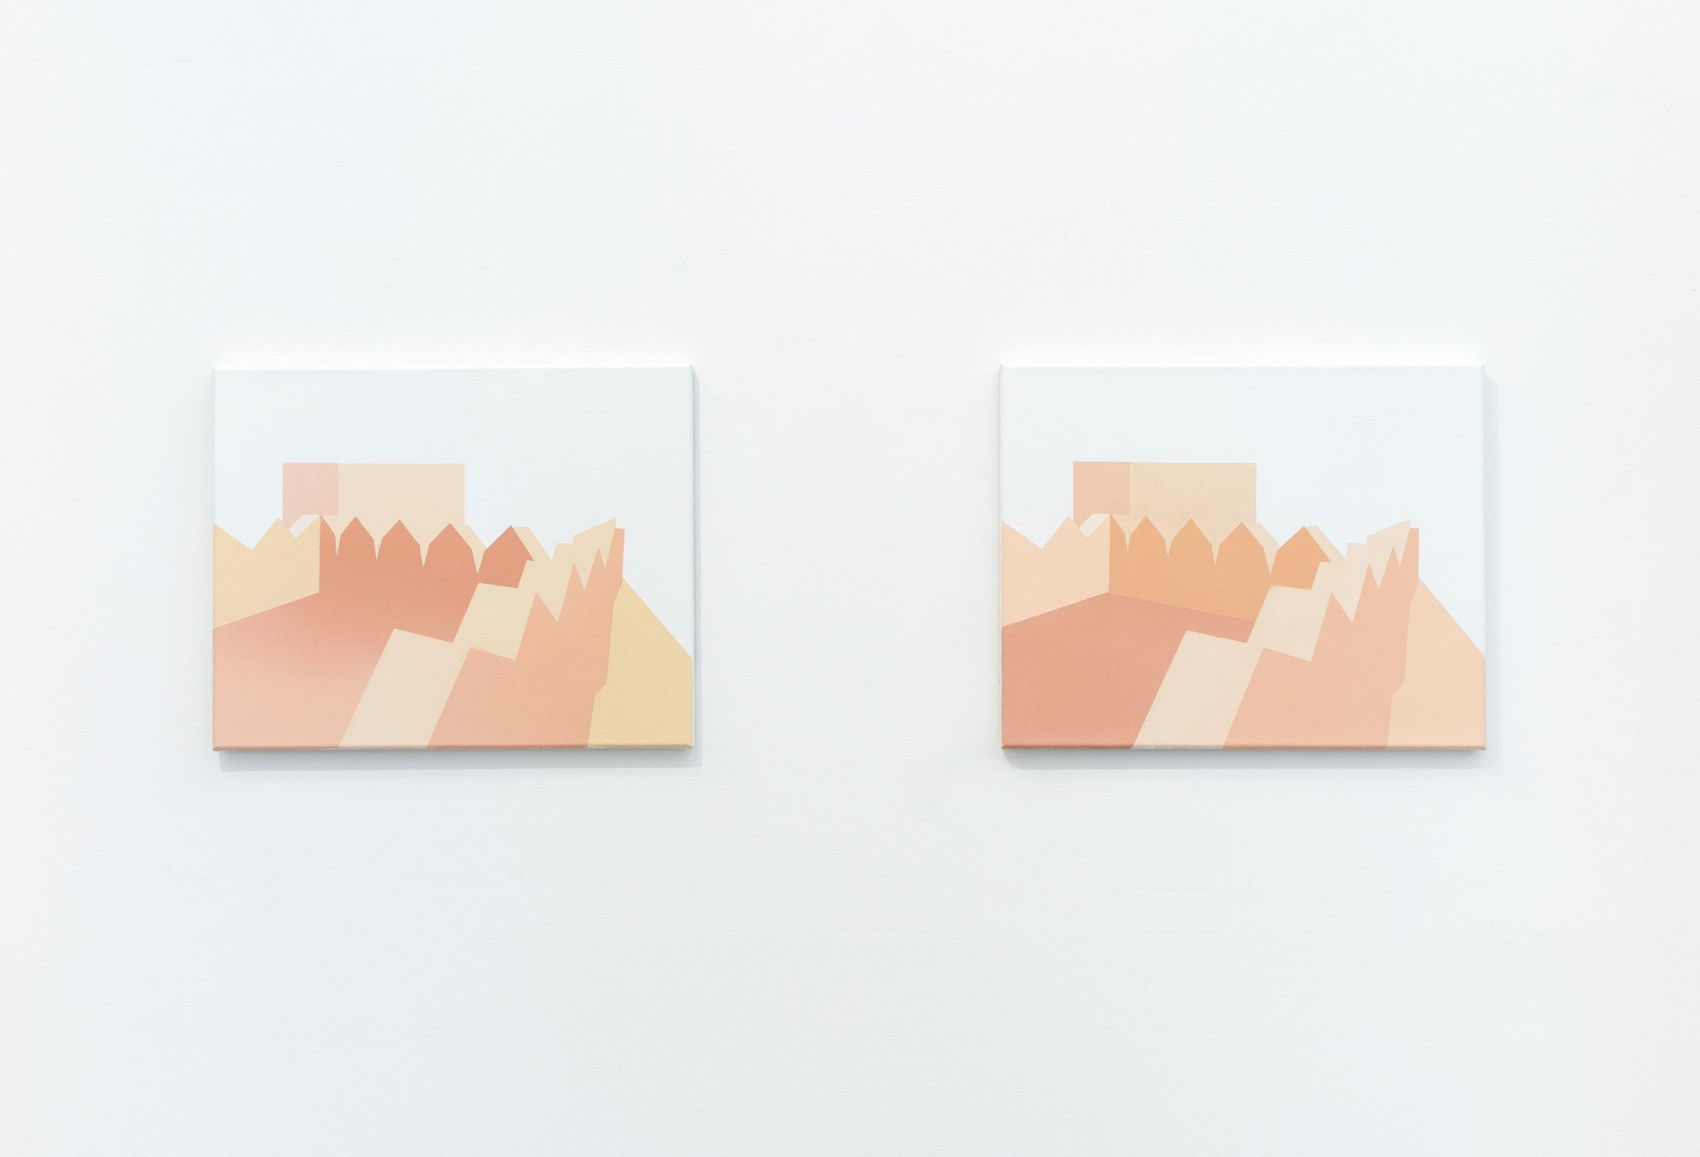 Manuel Stehli untitled (Festung I, Festung II), 2019, 2×40×50 cm, oil on canvas, Courtesy of the artist and Lemoyne